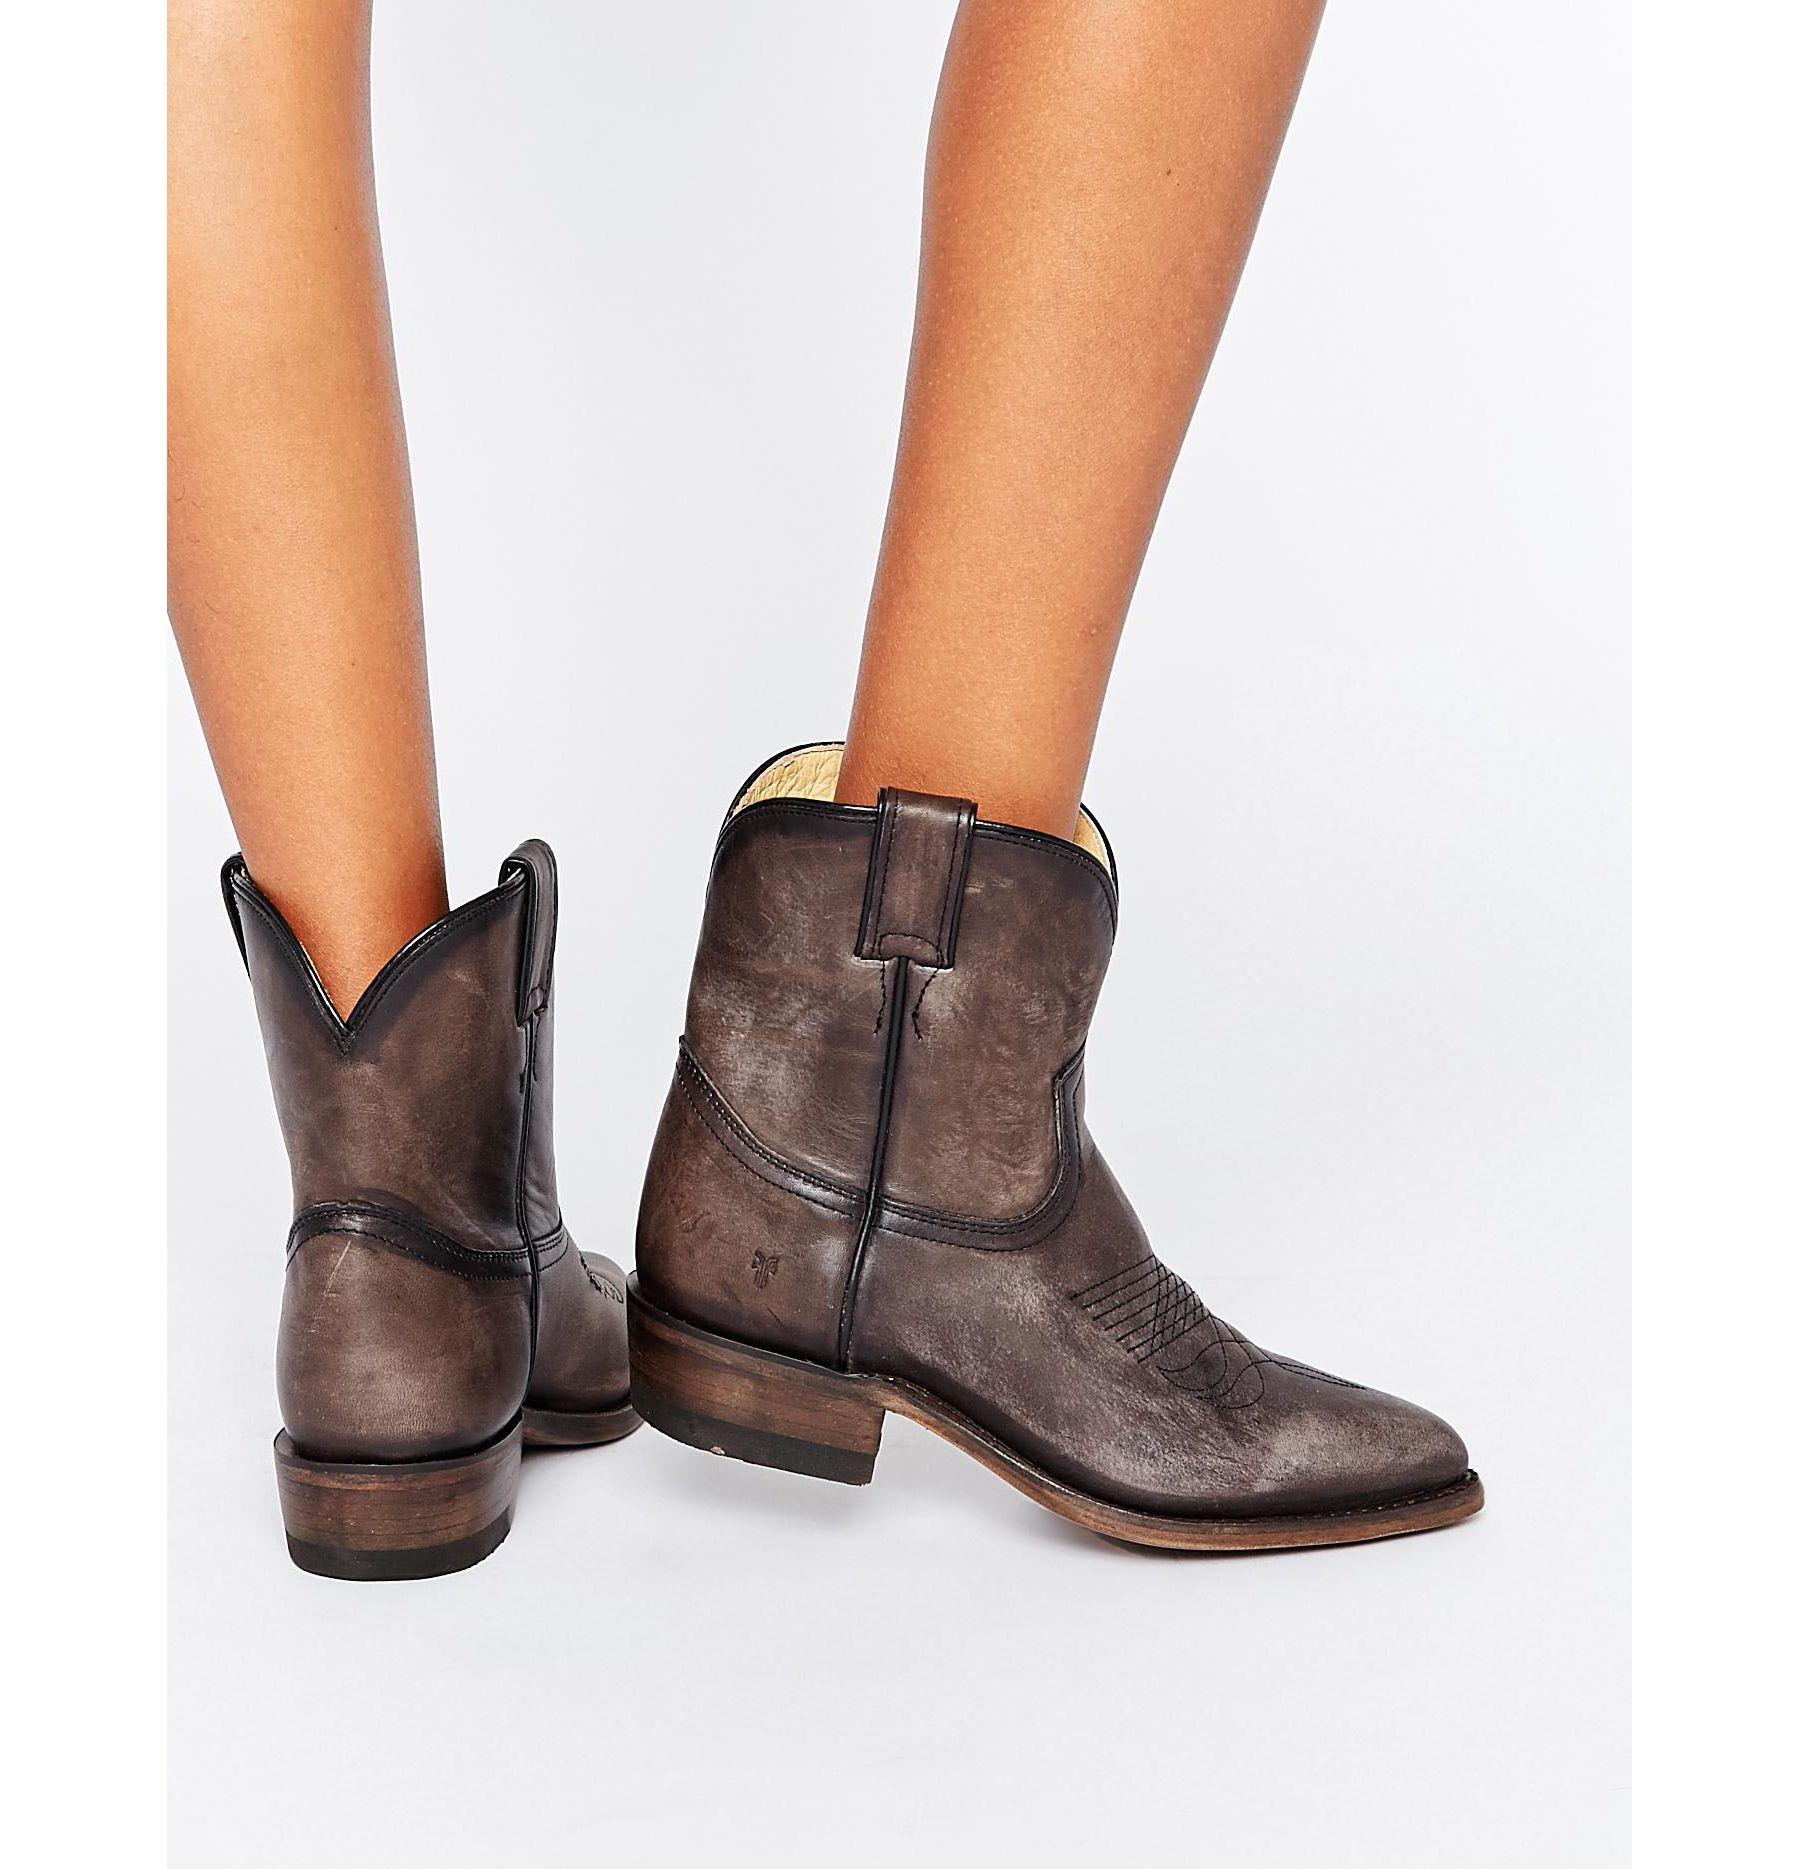 378d0437b9d Lyst - Frye Billy Short Leather Western Boots